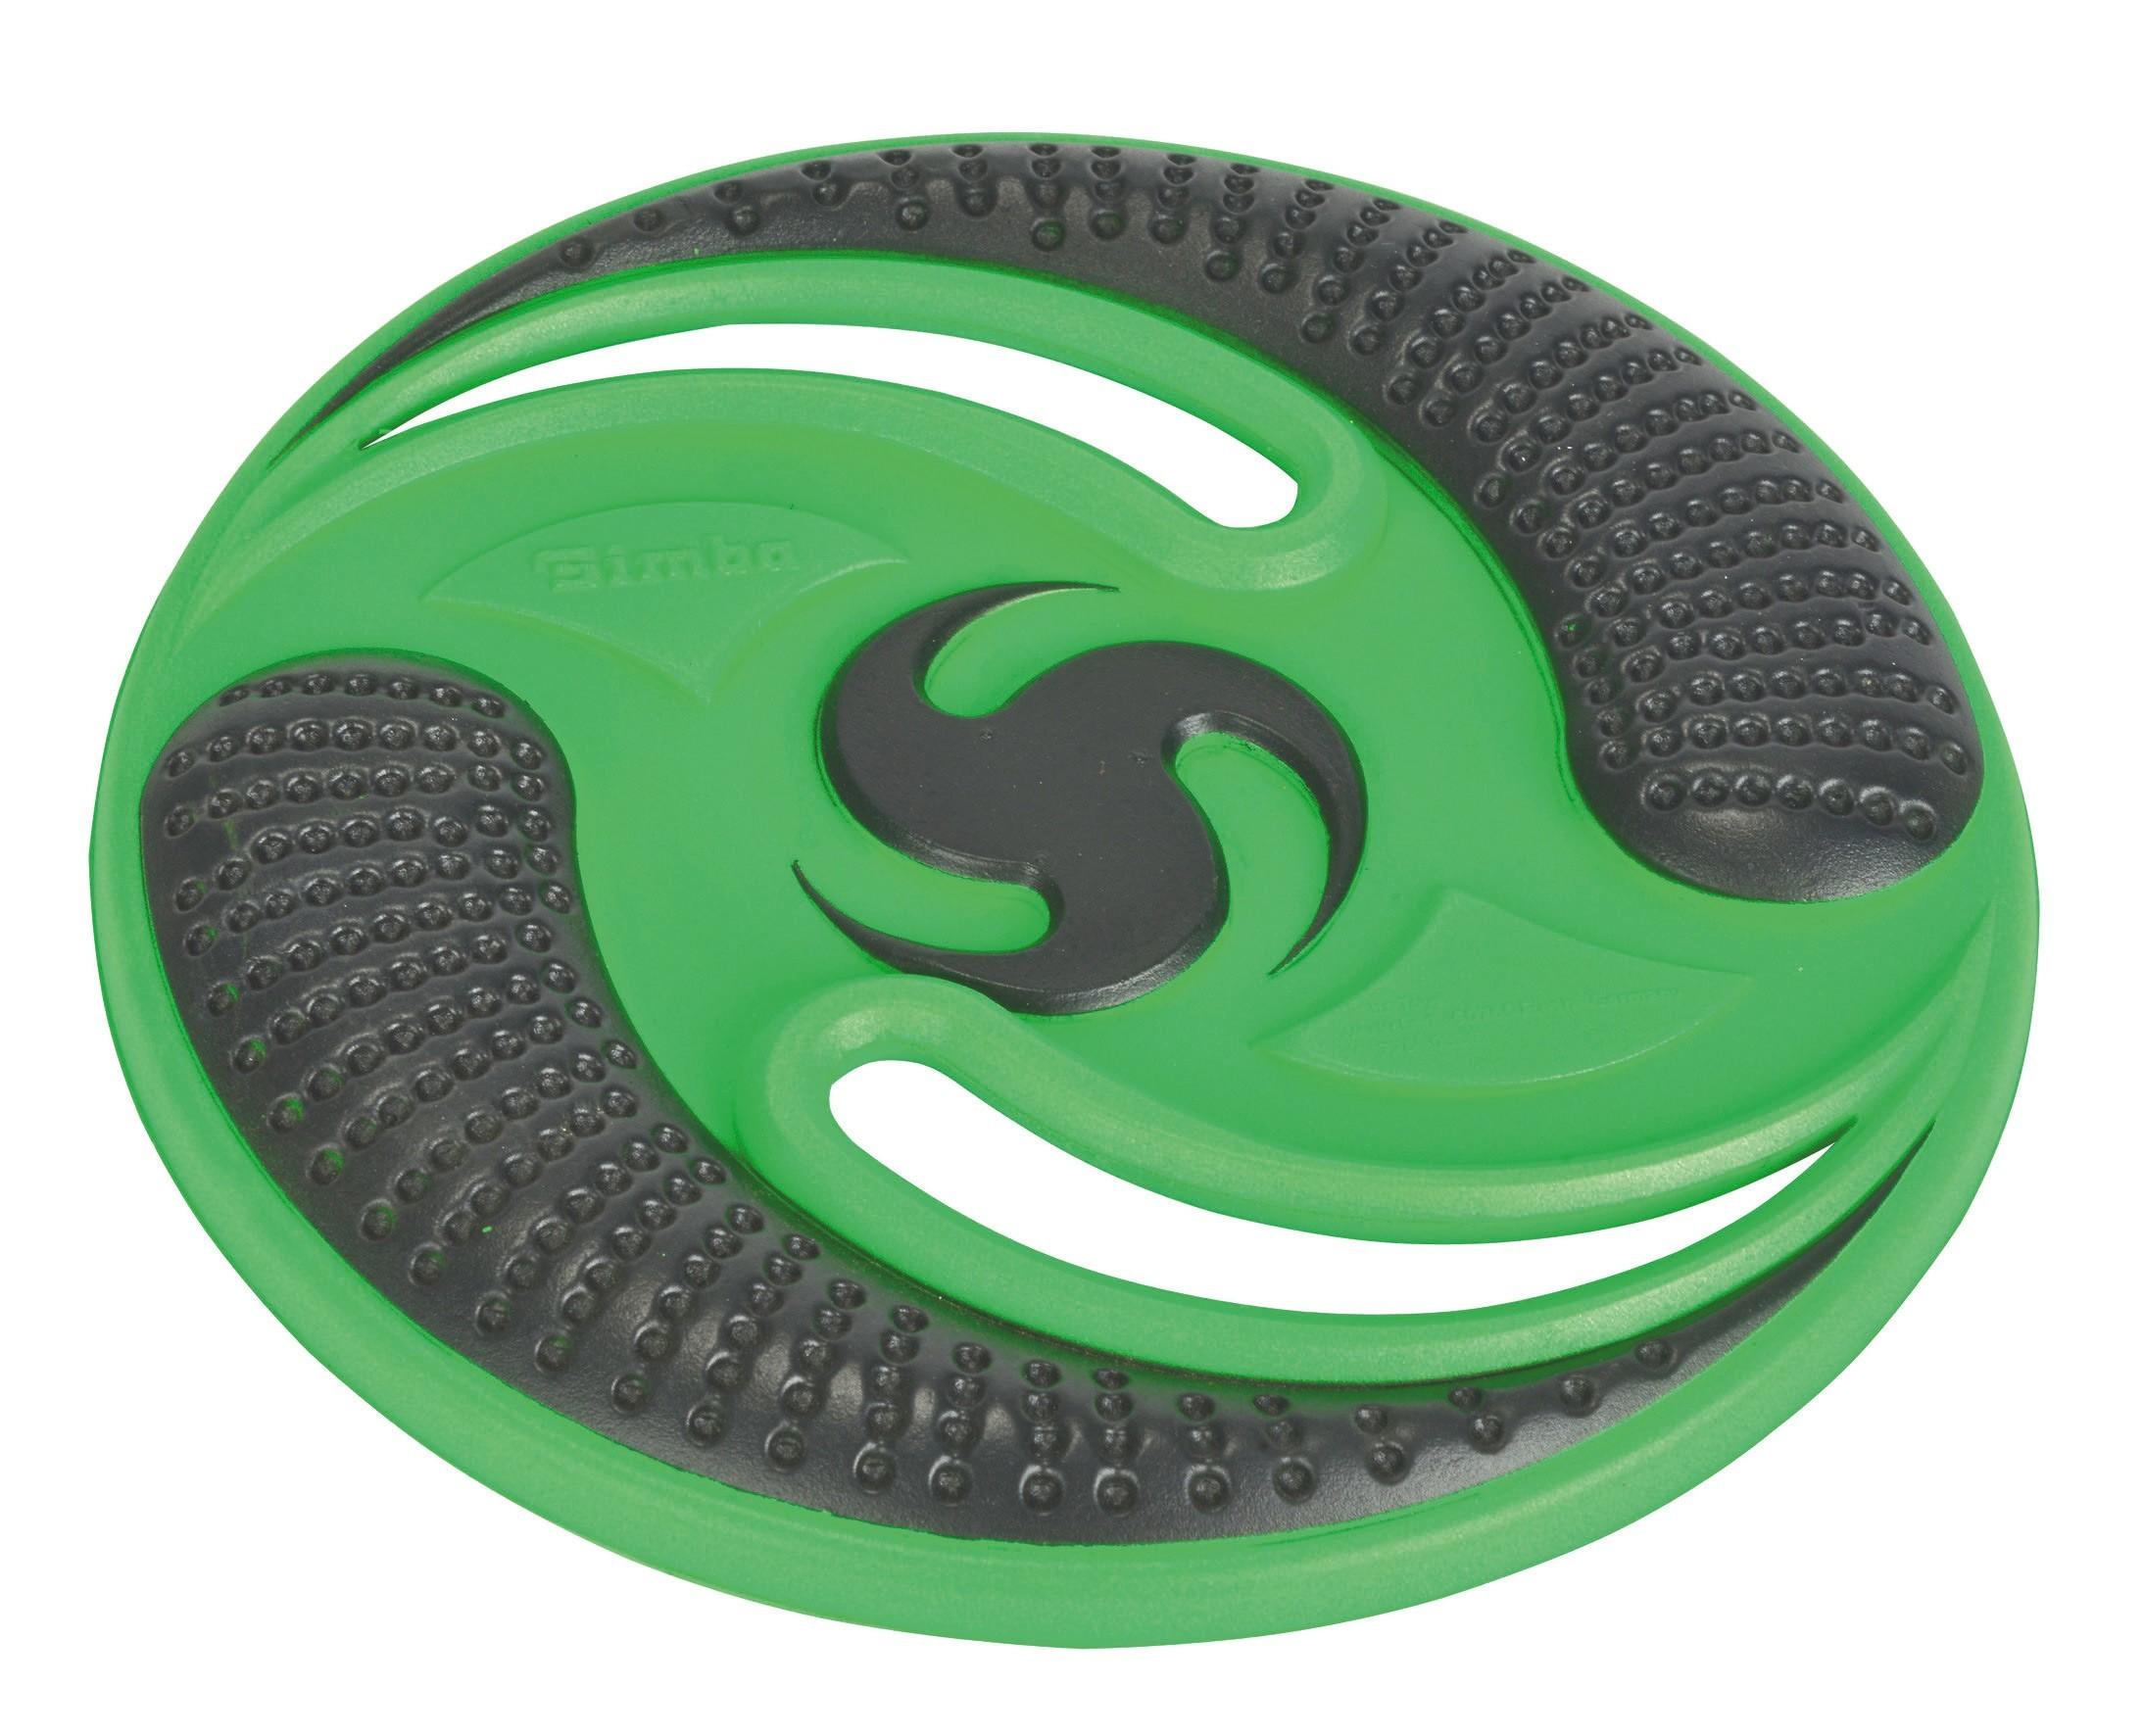 Frisbeescheibe Cyberdisc Soft Simba Bild 1